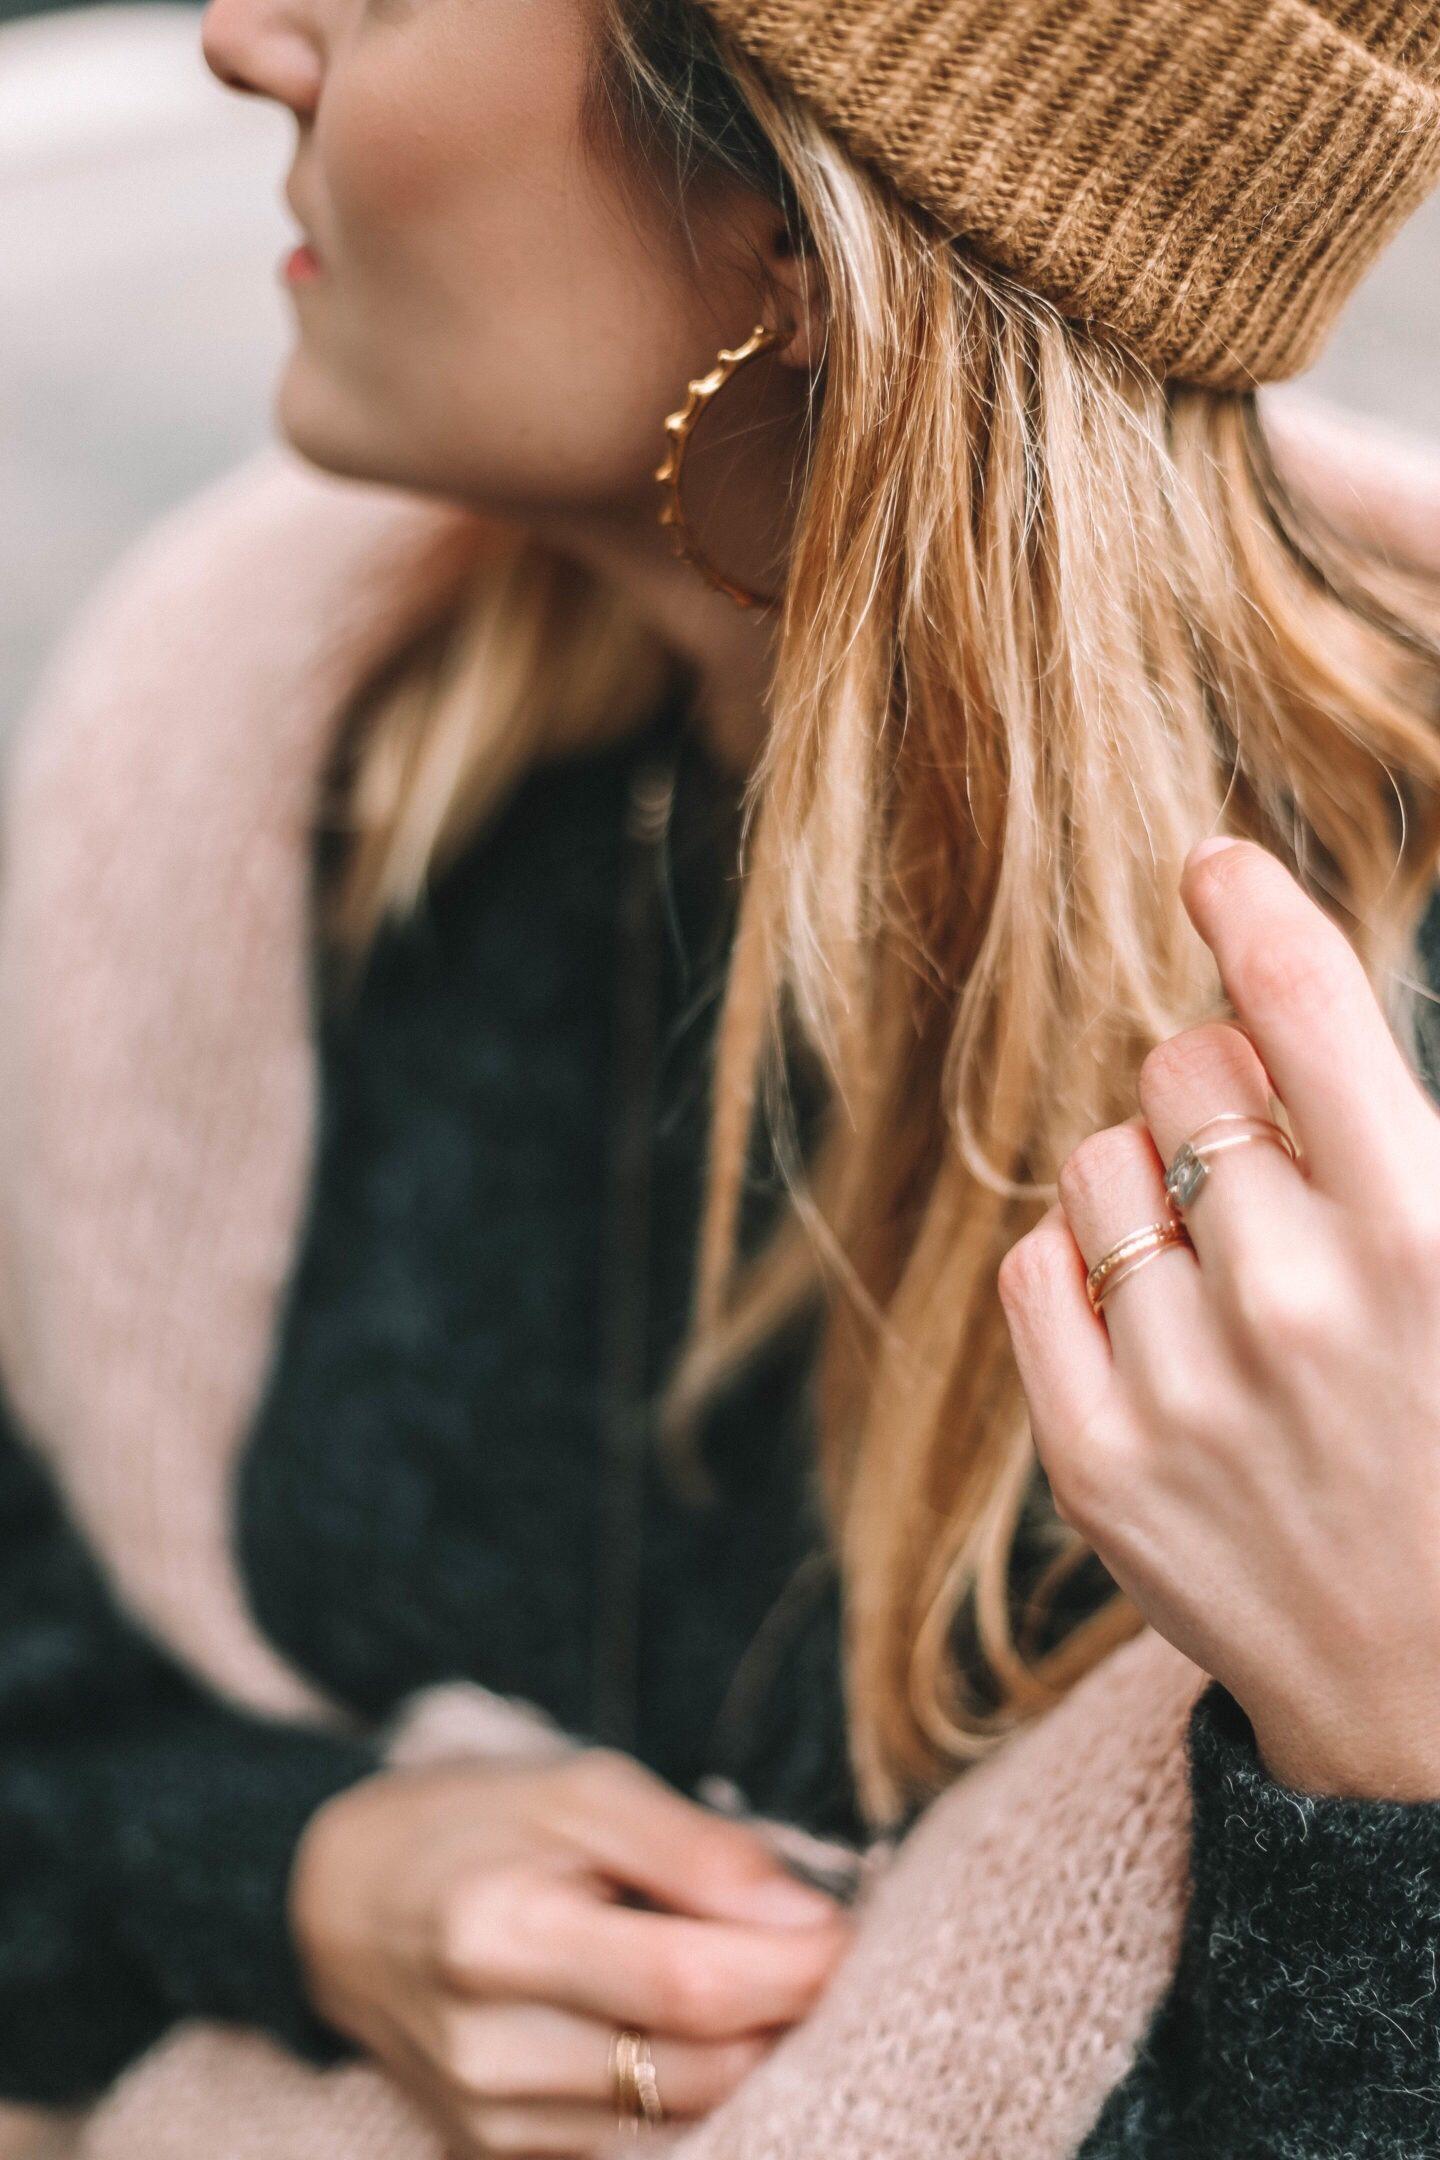 Uno de 50 - Blondie baby blog mode et voyages